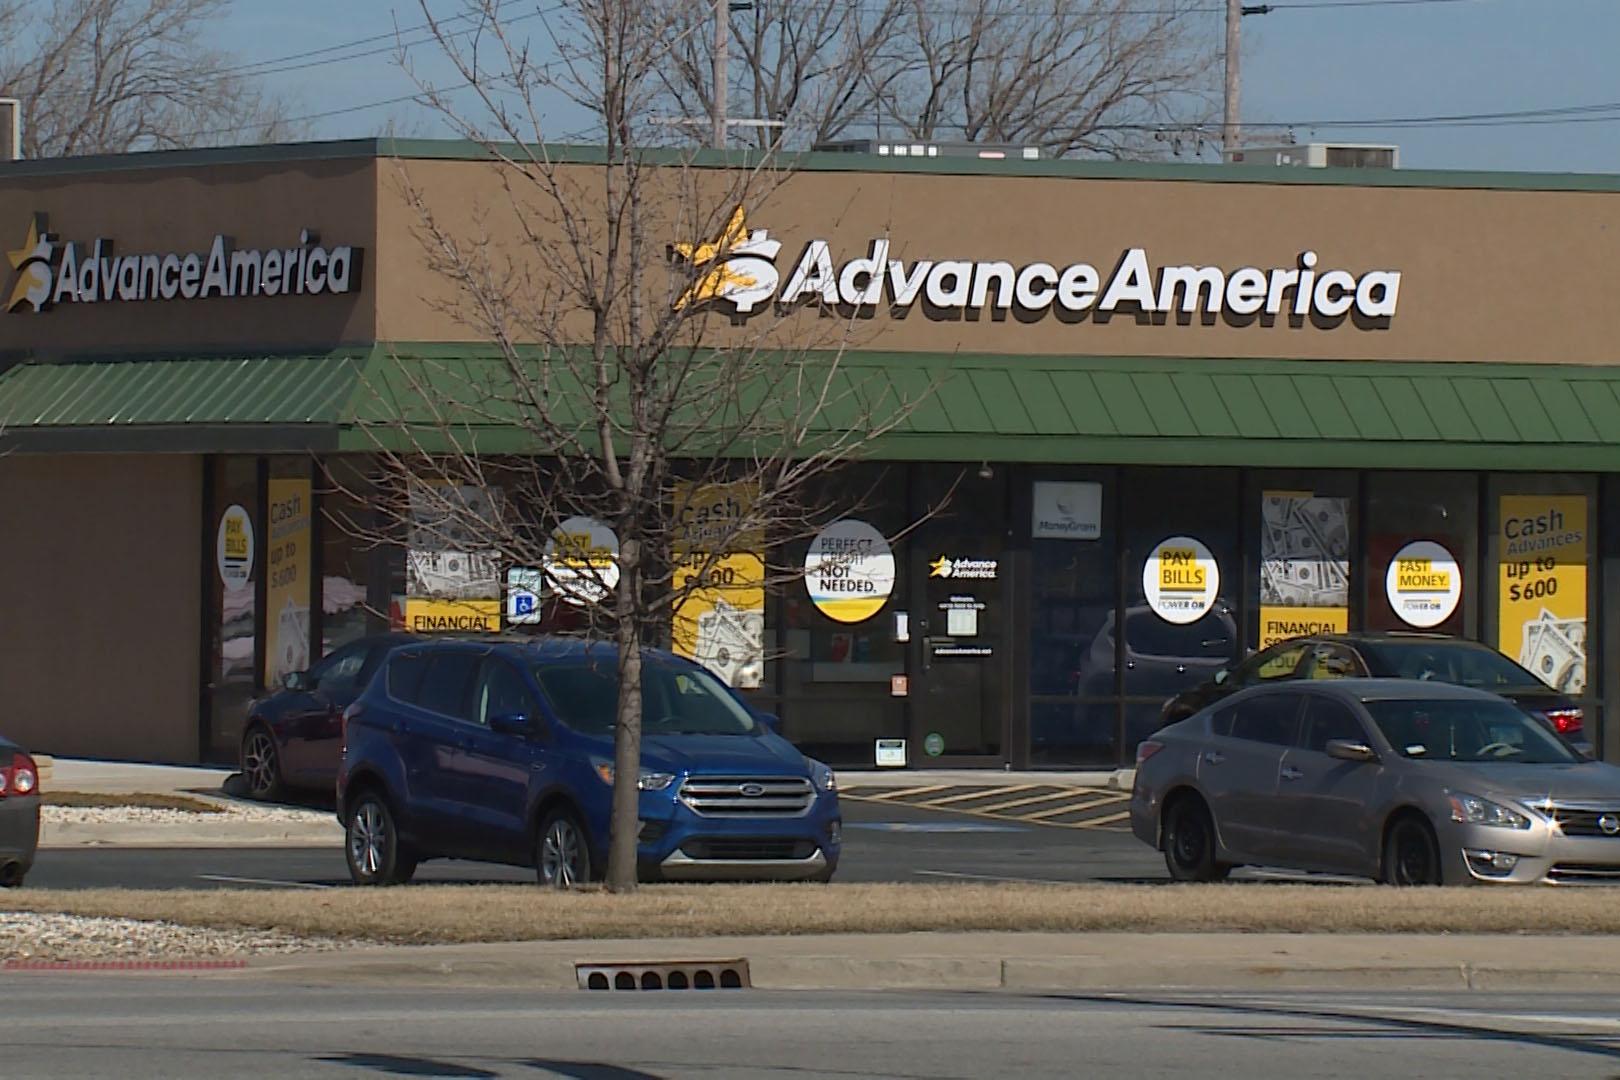 advance-america.jpg